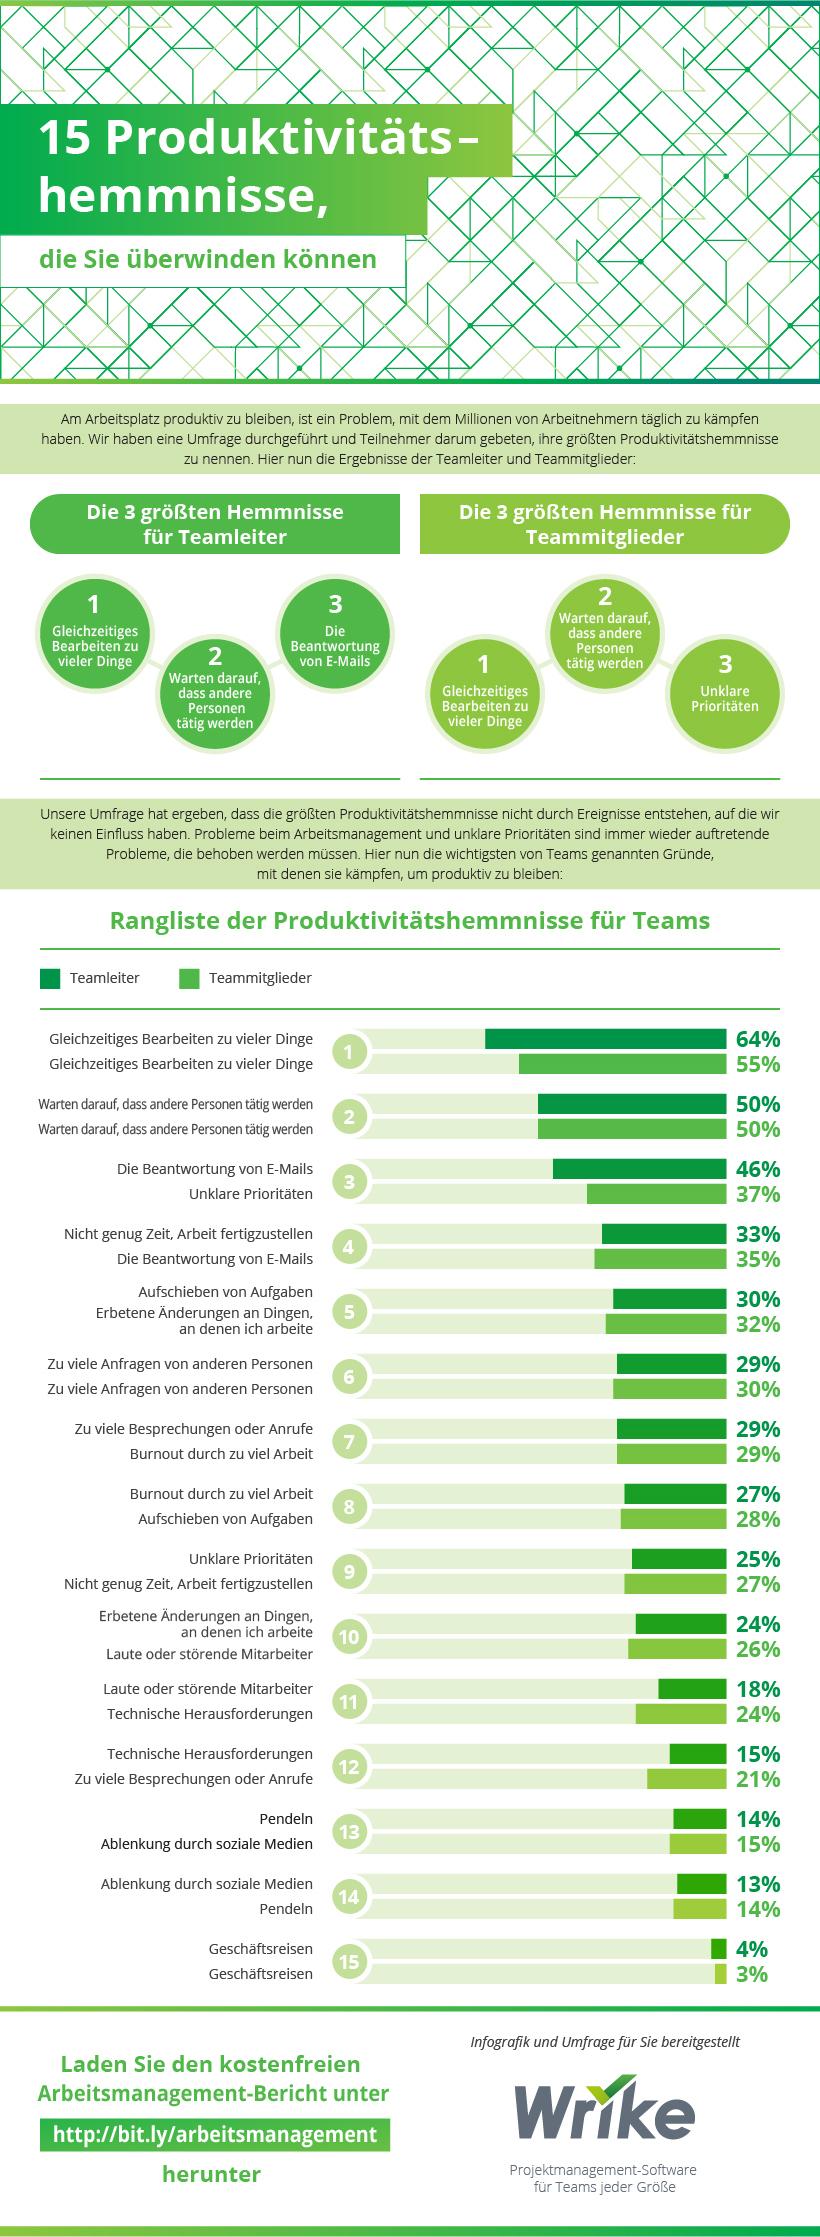 15-Produktivitaets-Hemmnisse-Infografik